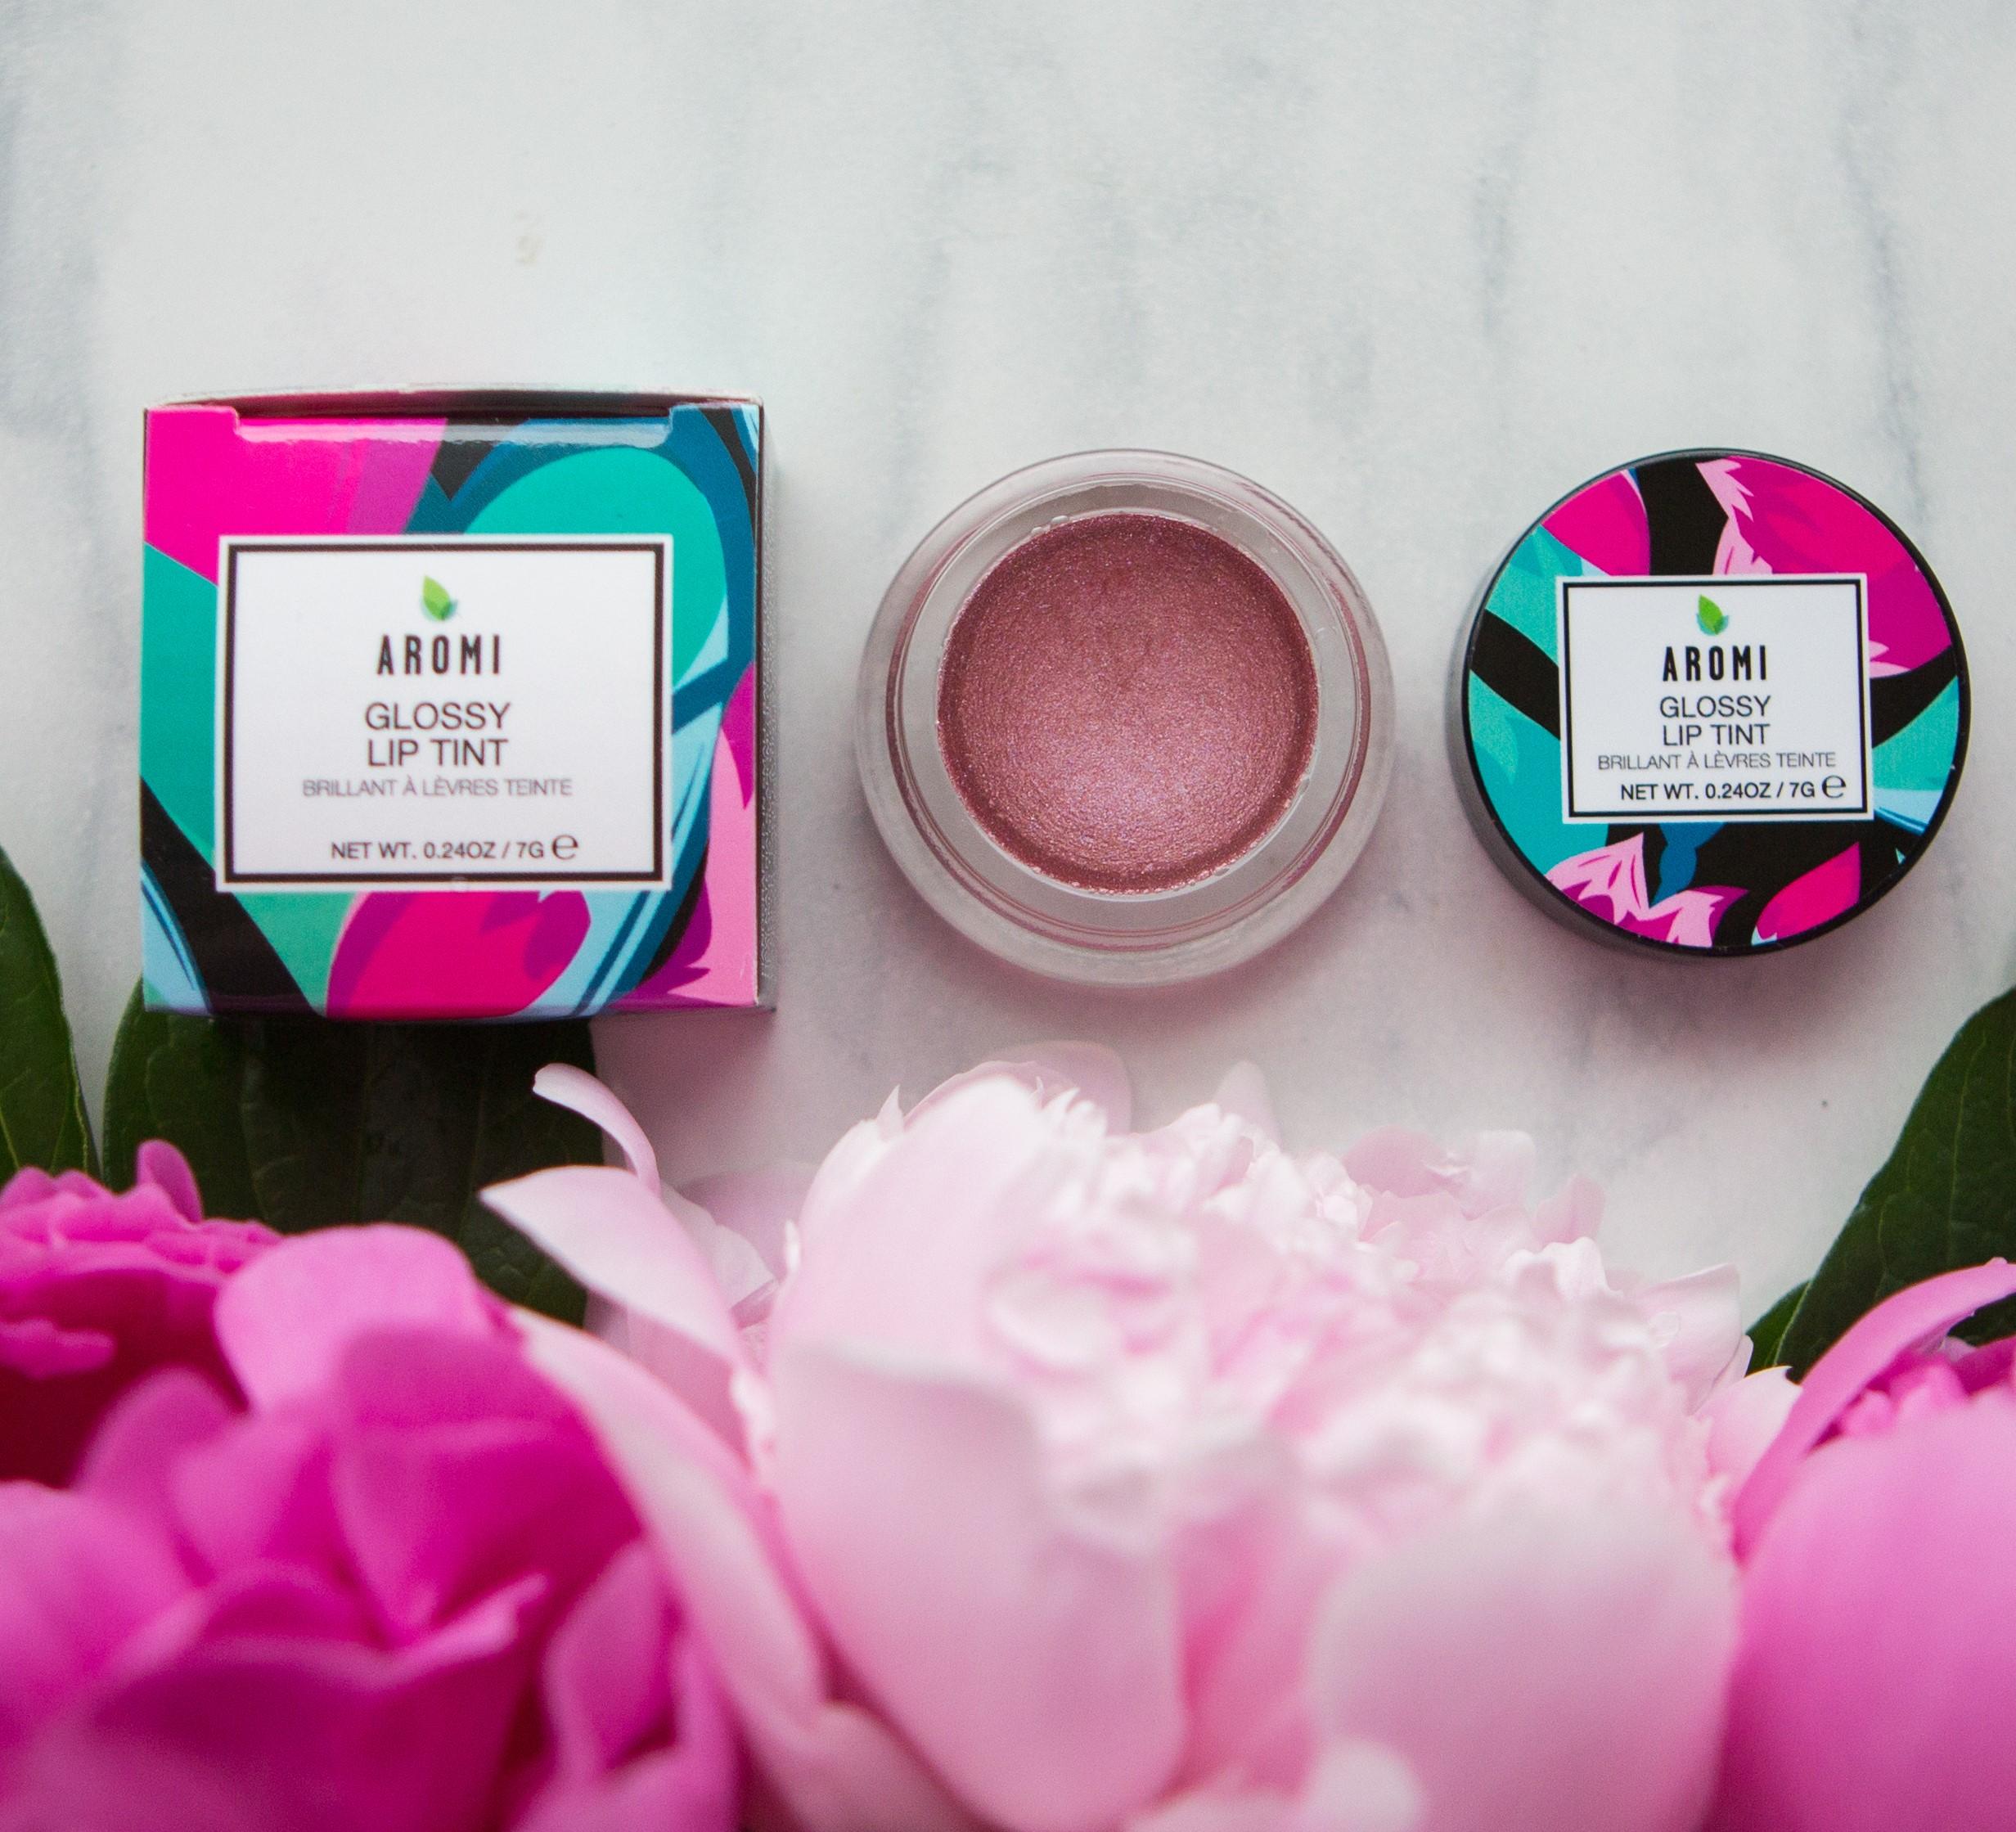 Aromi Rose Quartz Glossy Lip Tint